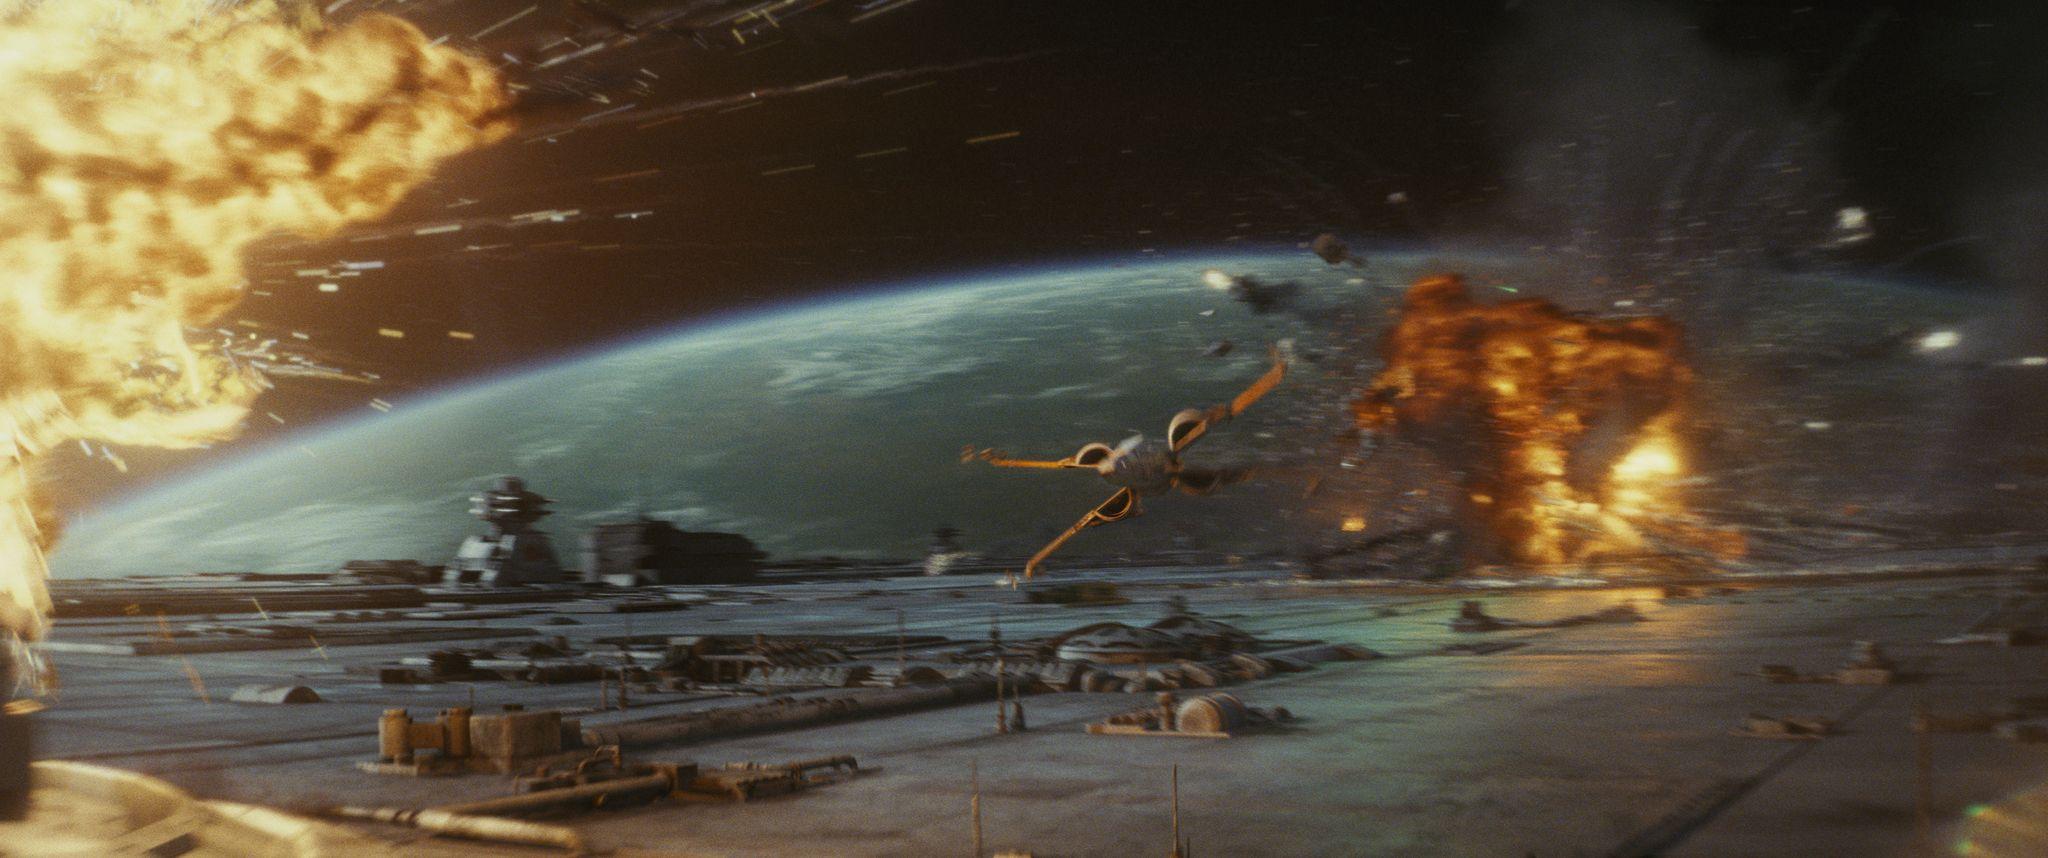 'The Last Jedi' Is the History of Human Warfare in Reverse